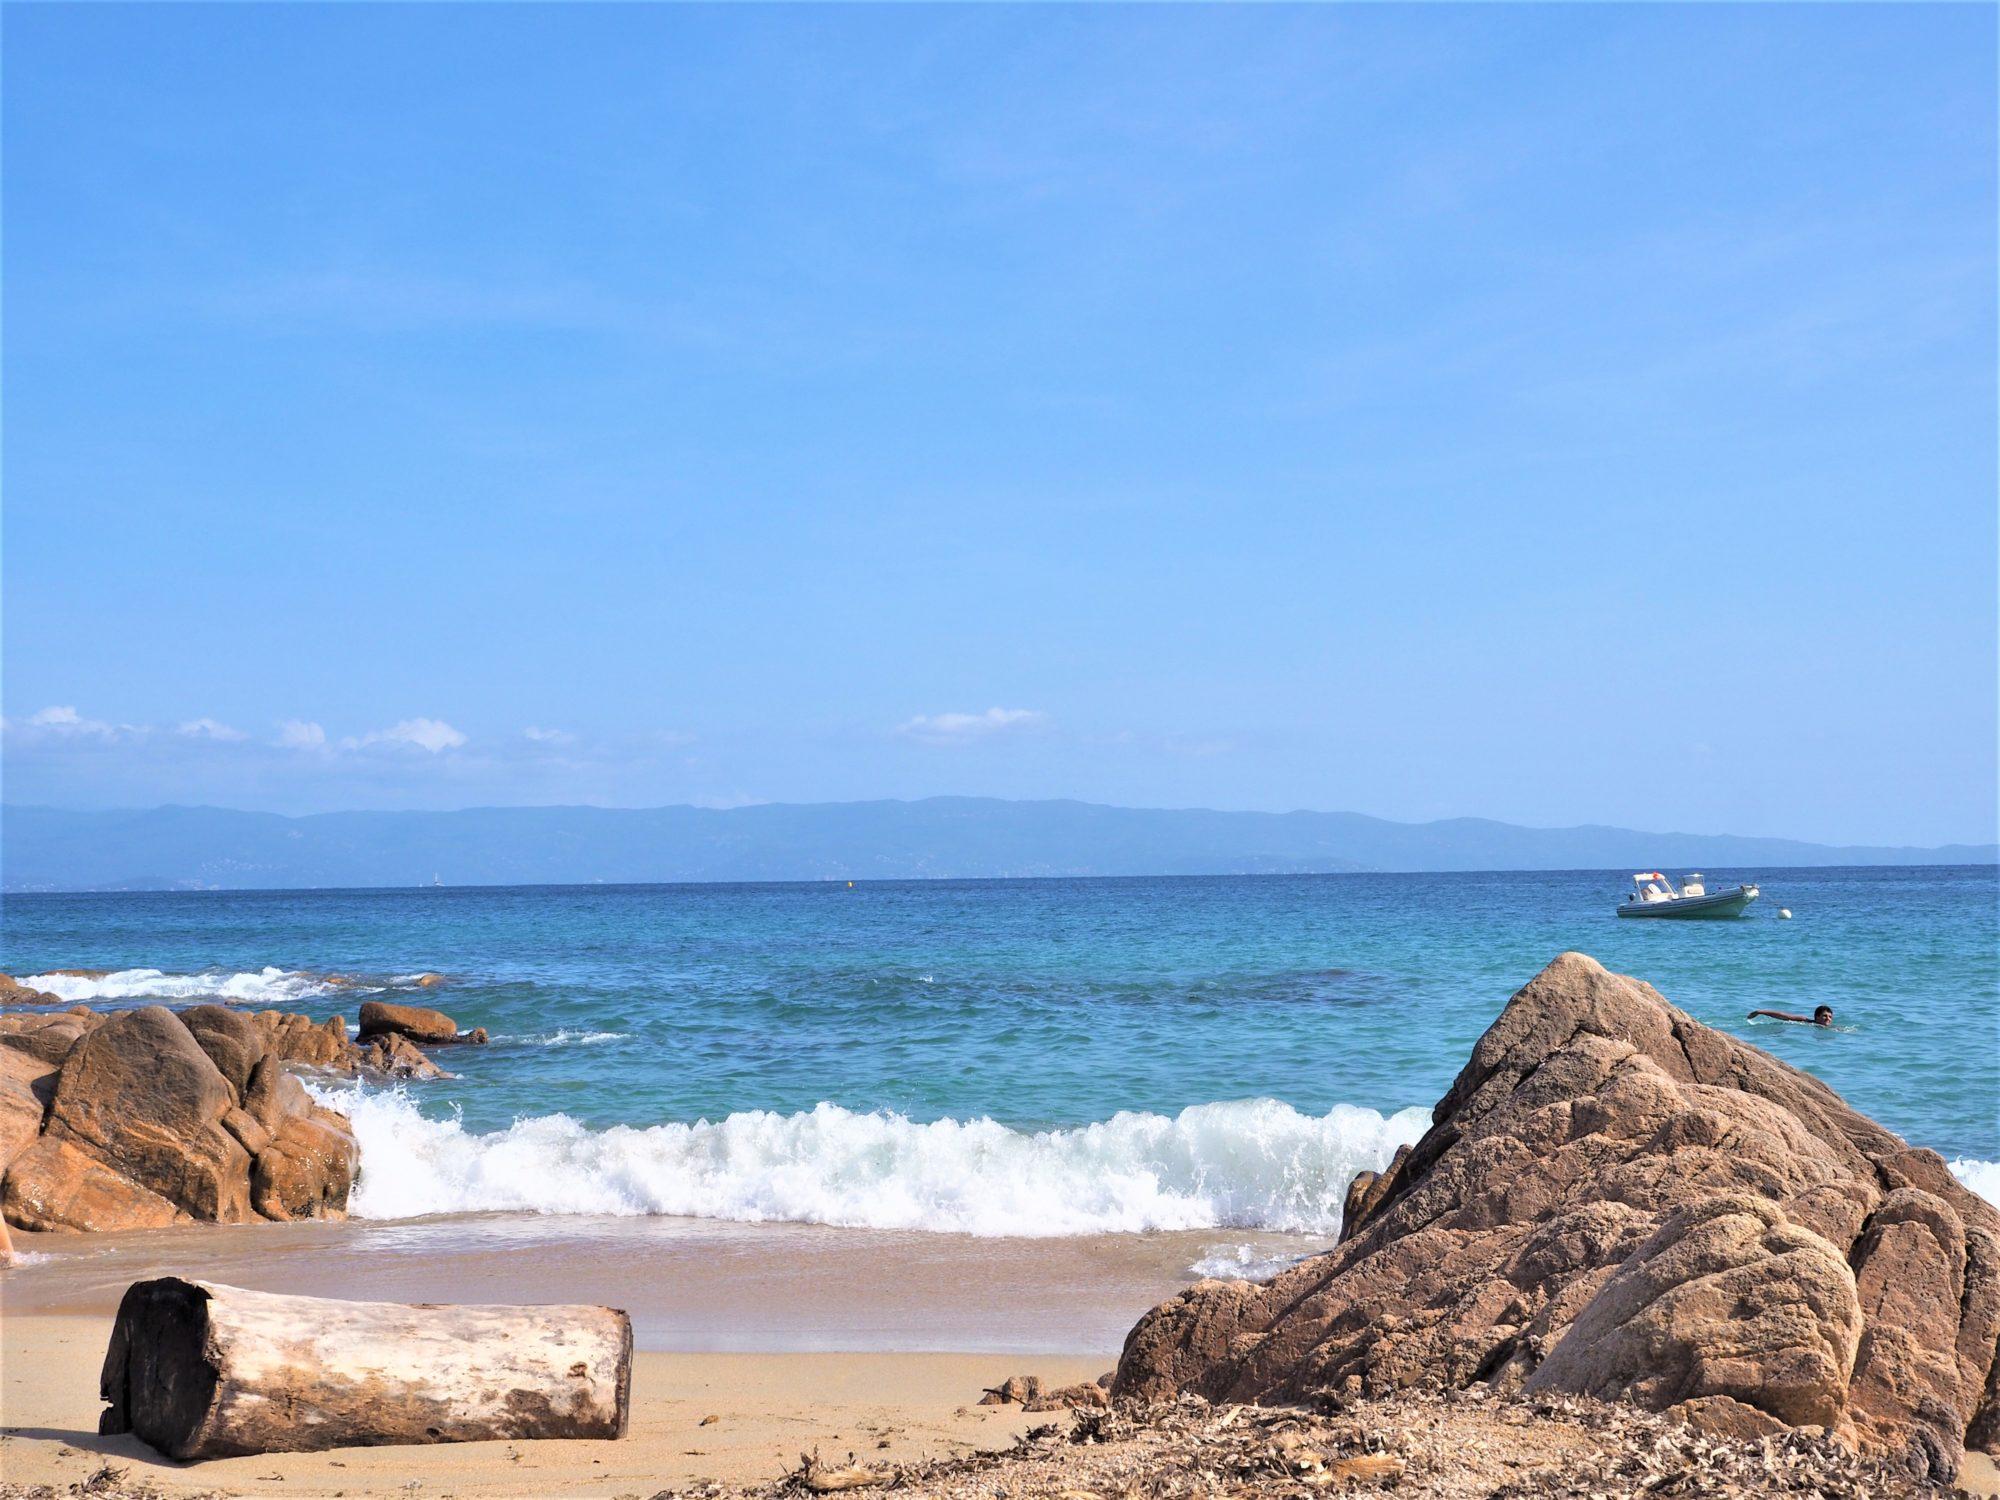 Moorea, plage à Ajaccio, Corse du Sud